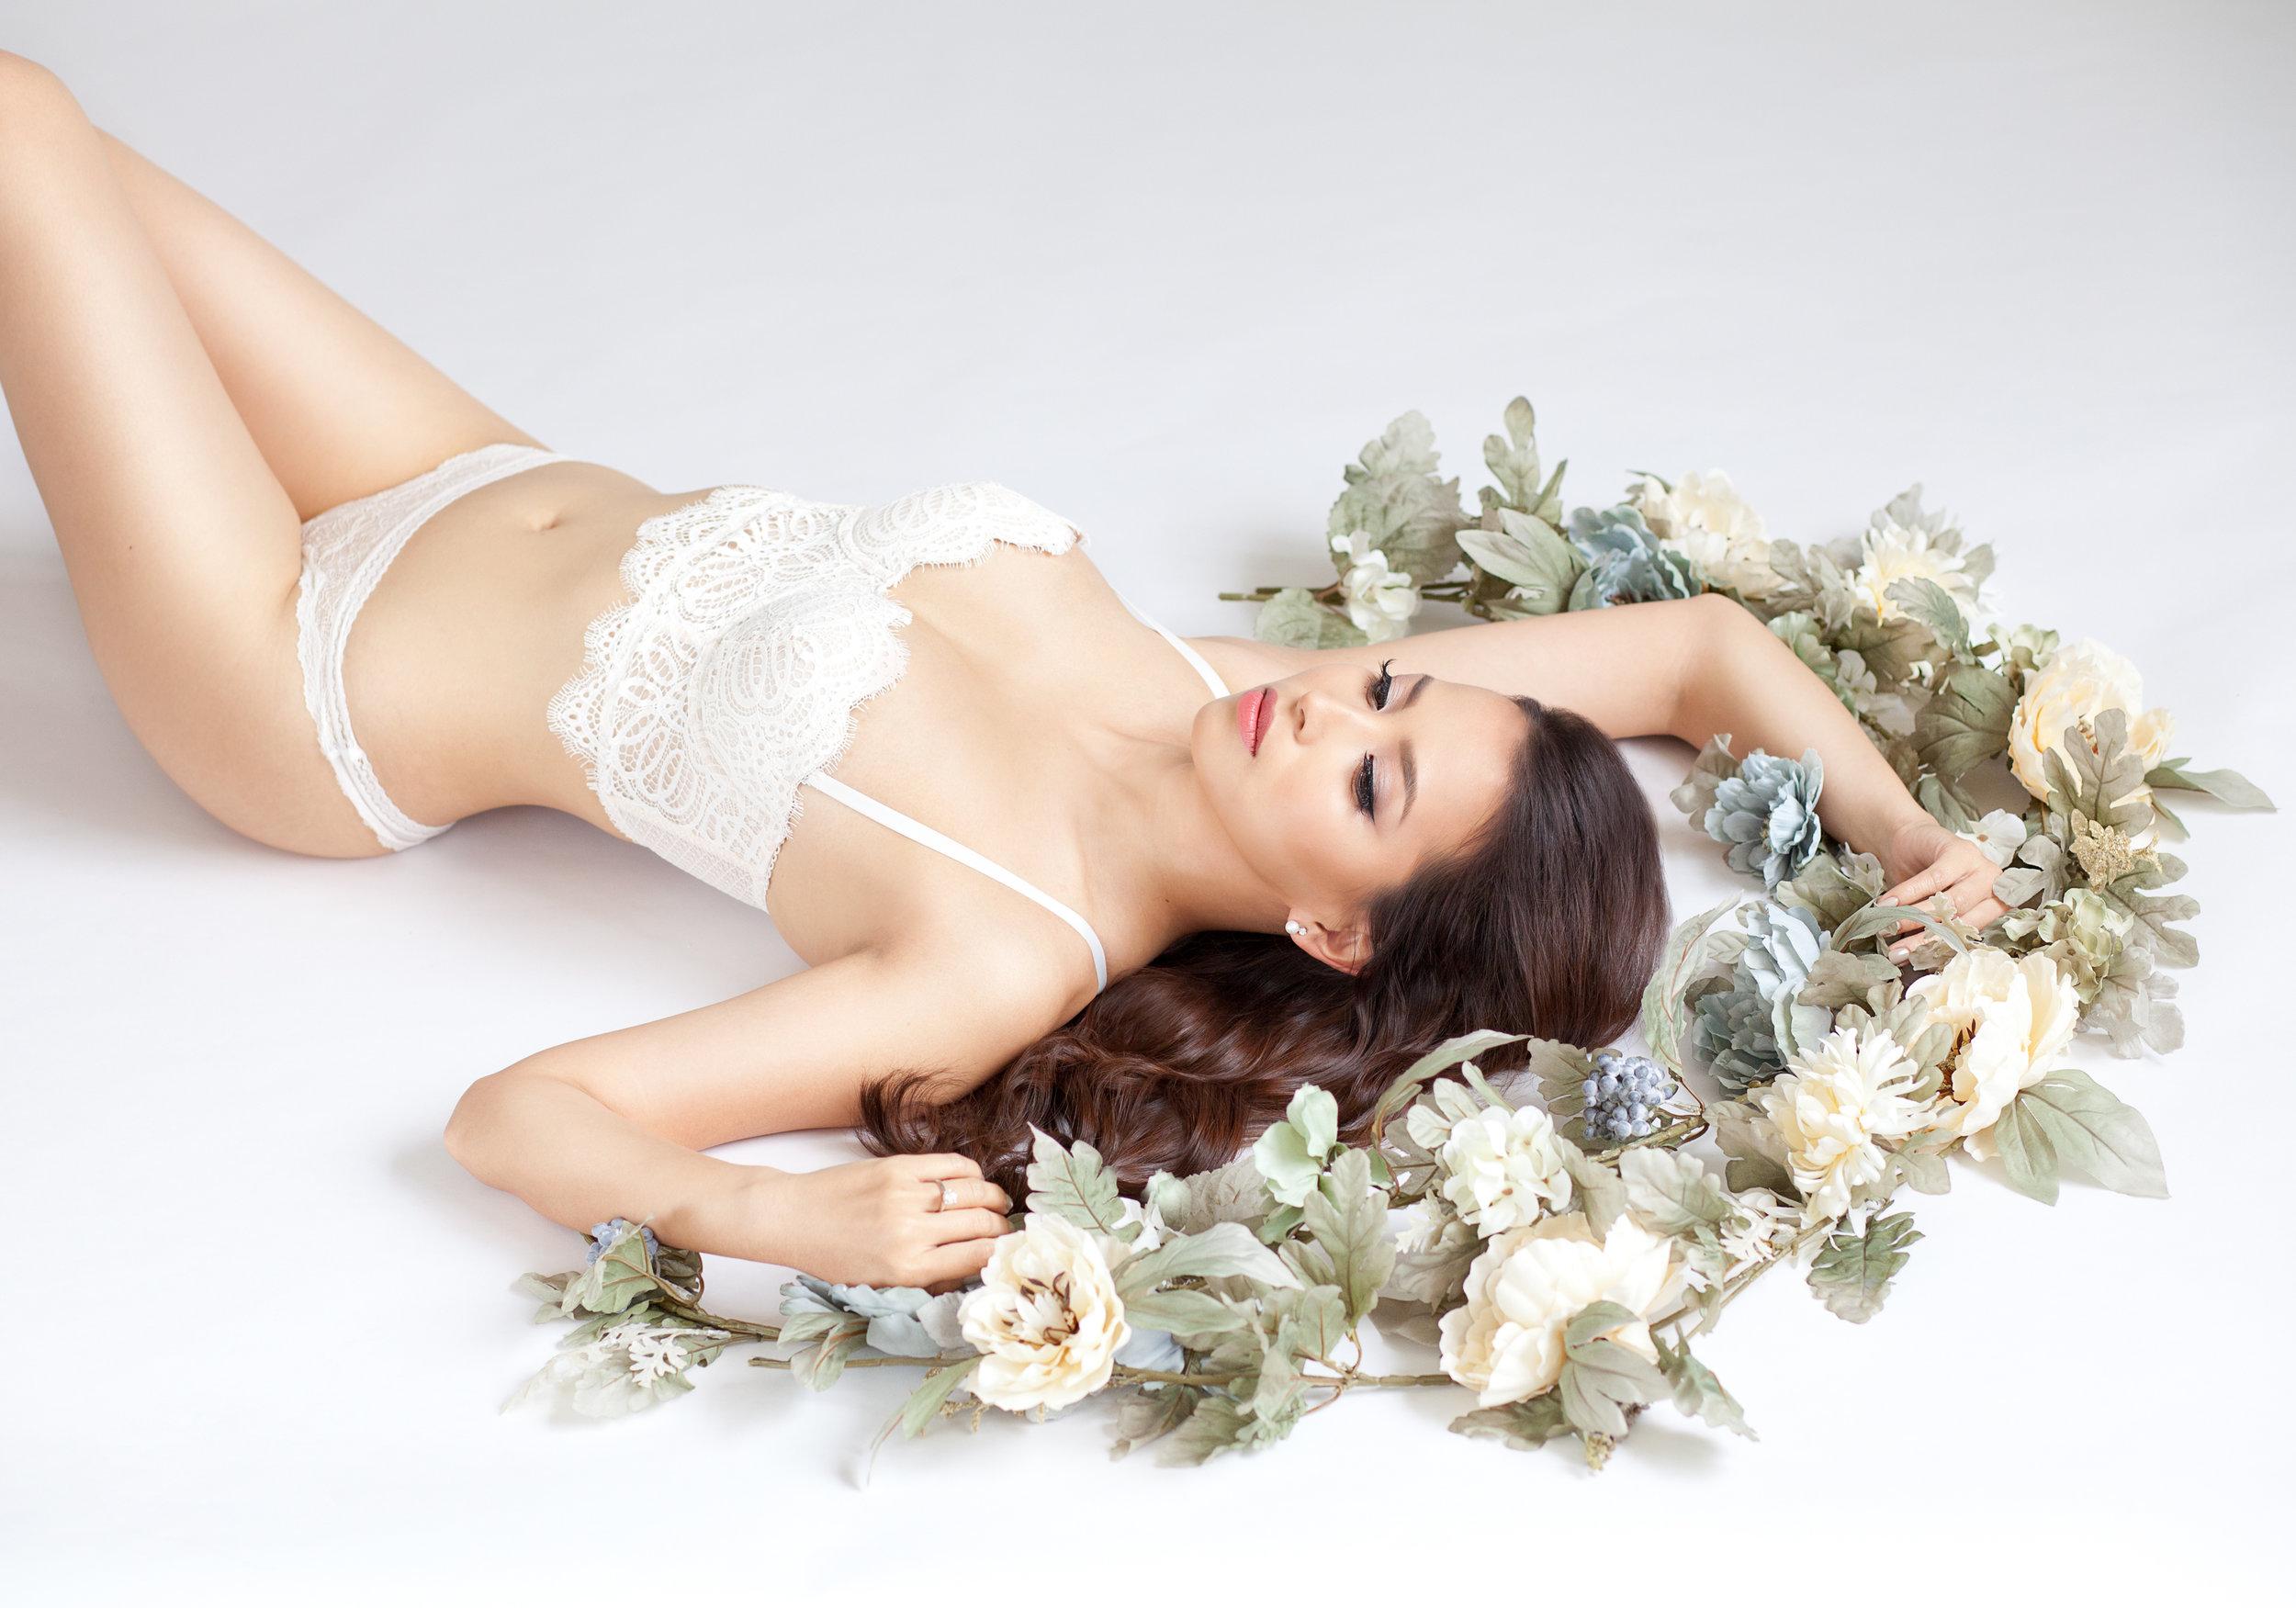 Stephanie-HighRes-CareyLynne-11.jpg